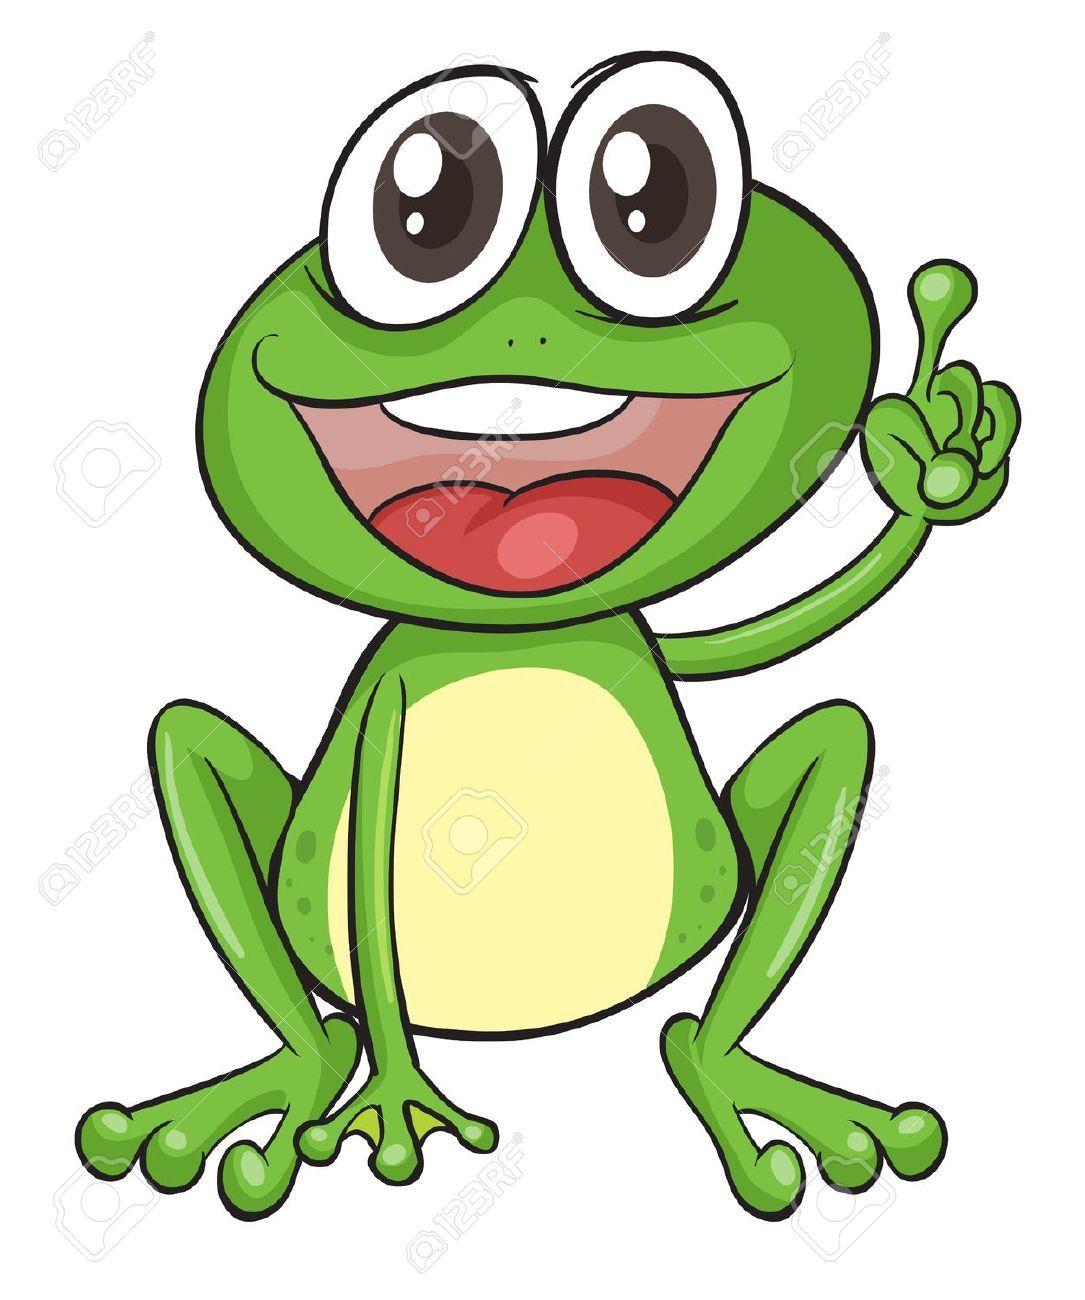 Frog clip art gallery frogs pinterest frogs clip art and frog clip art gallery voltagebd Images